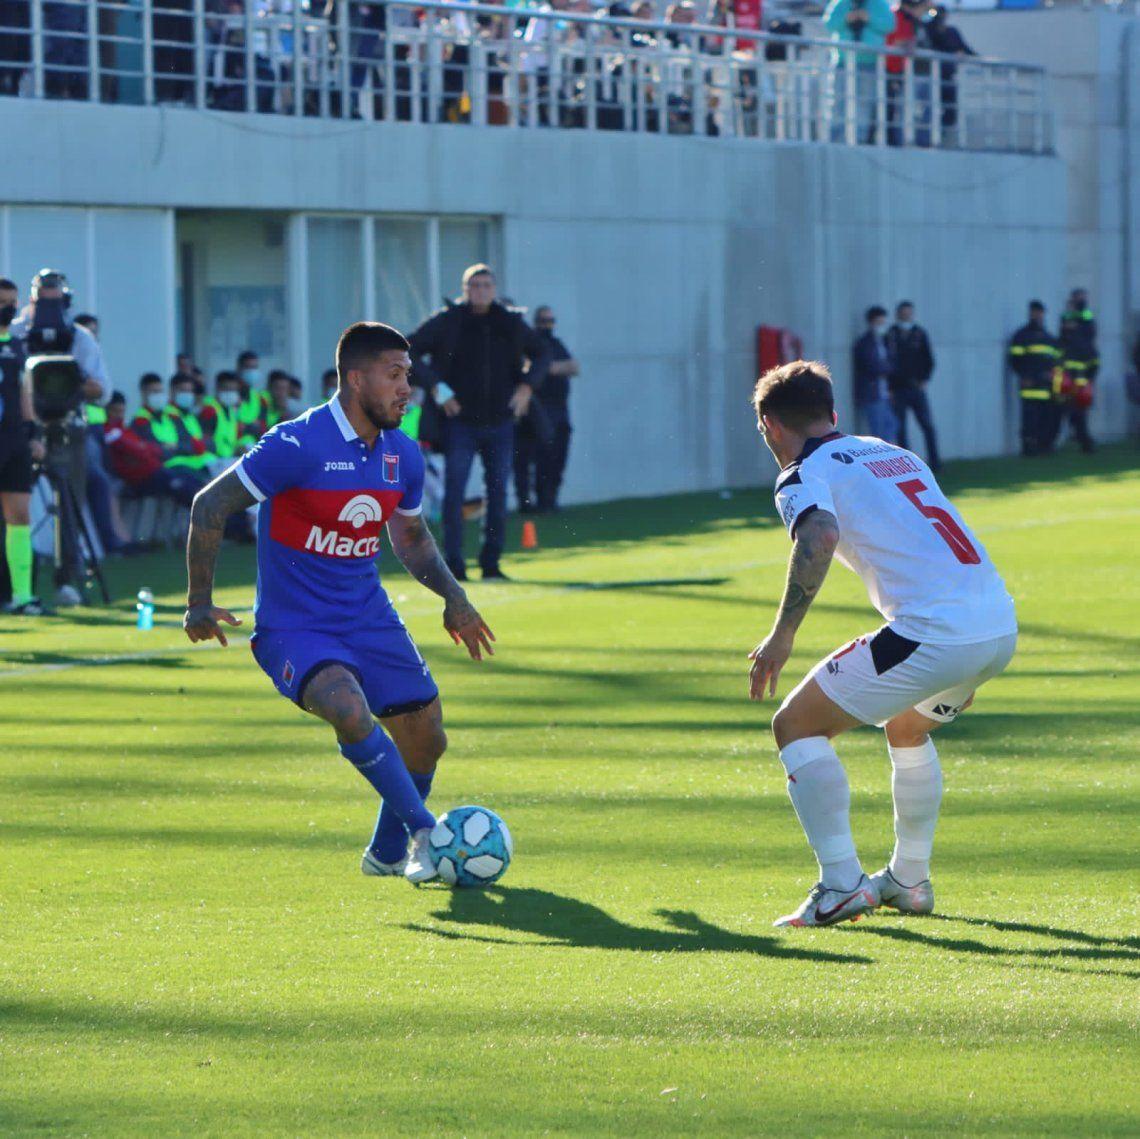 Tigre eliminó a Independiente de la Copa Argentina